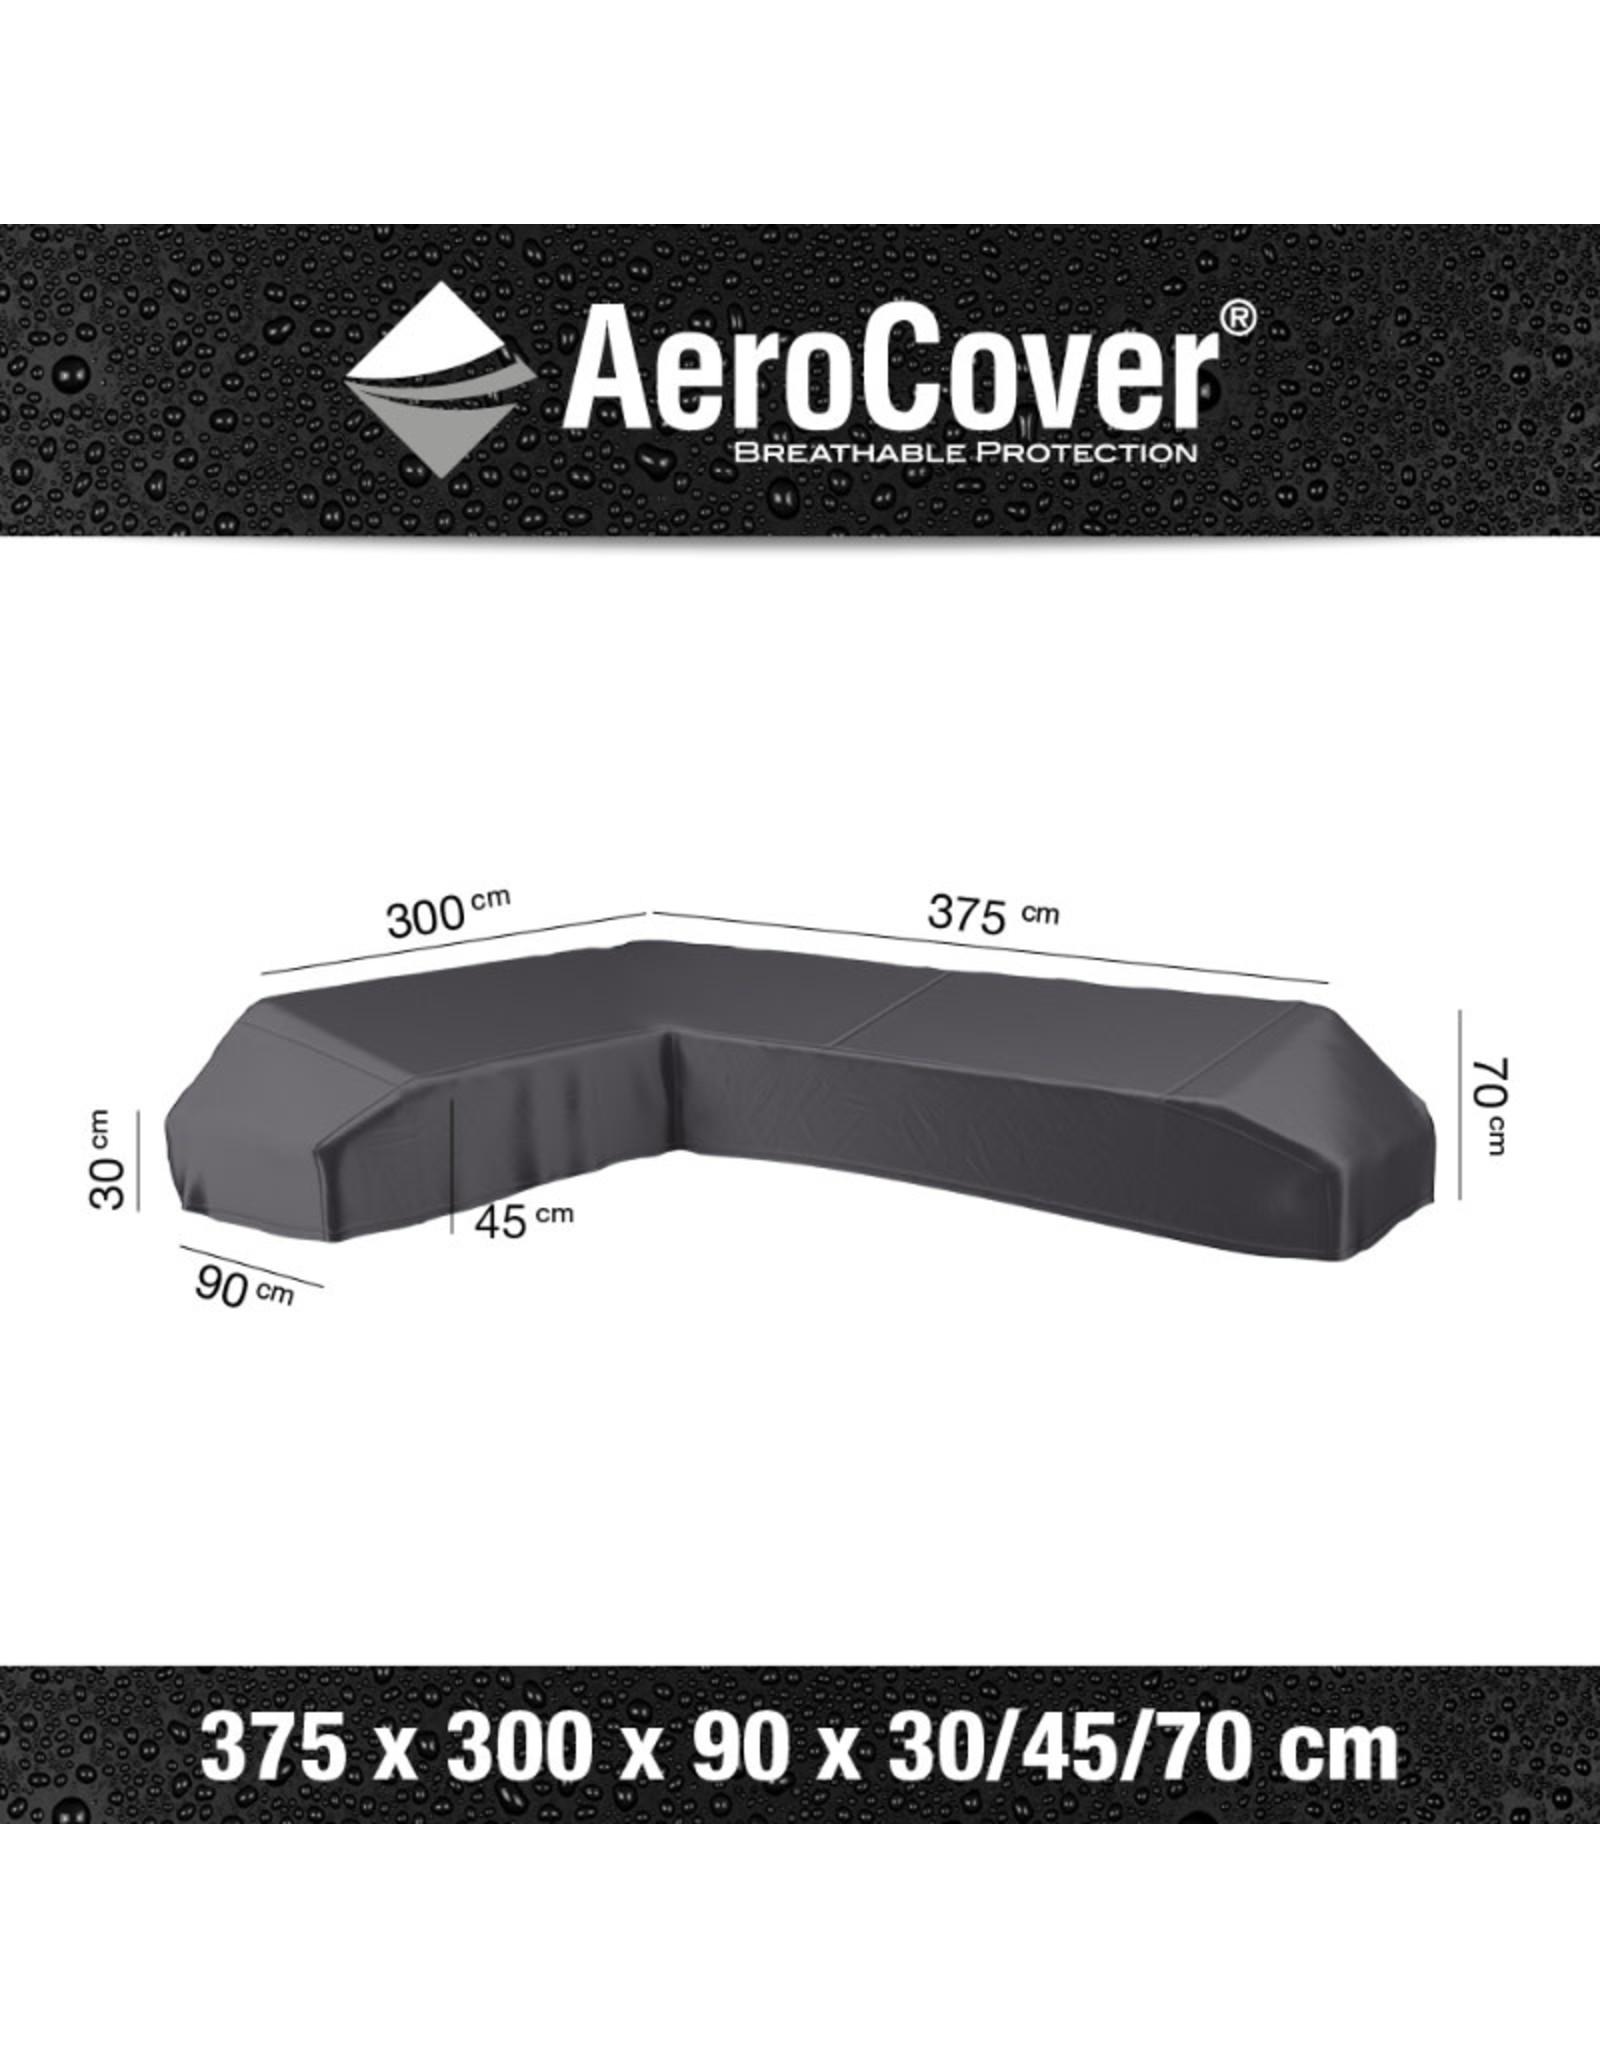 Aerocover Lounge sets L-shape platform sets 375x275x90xH30 / 45/70. Left